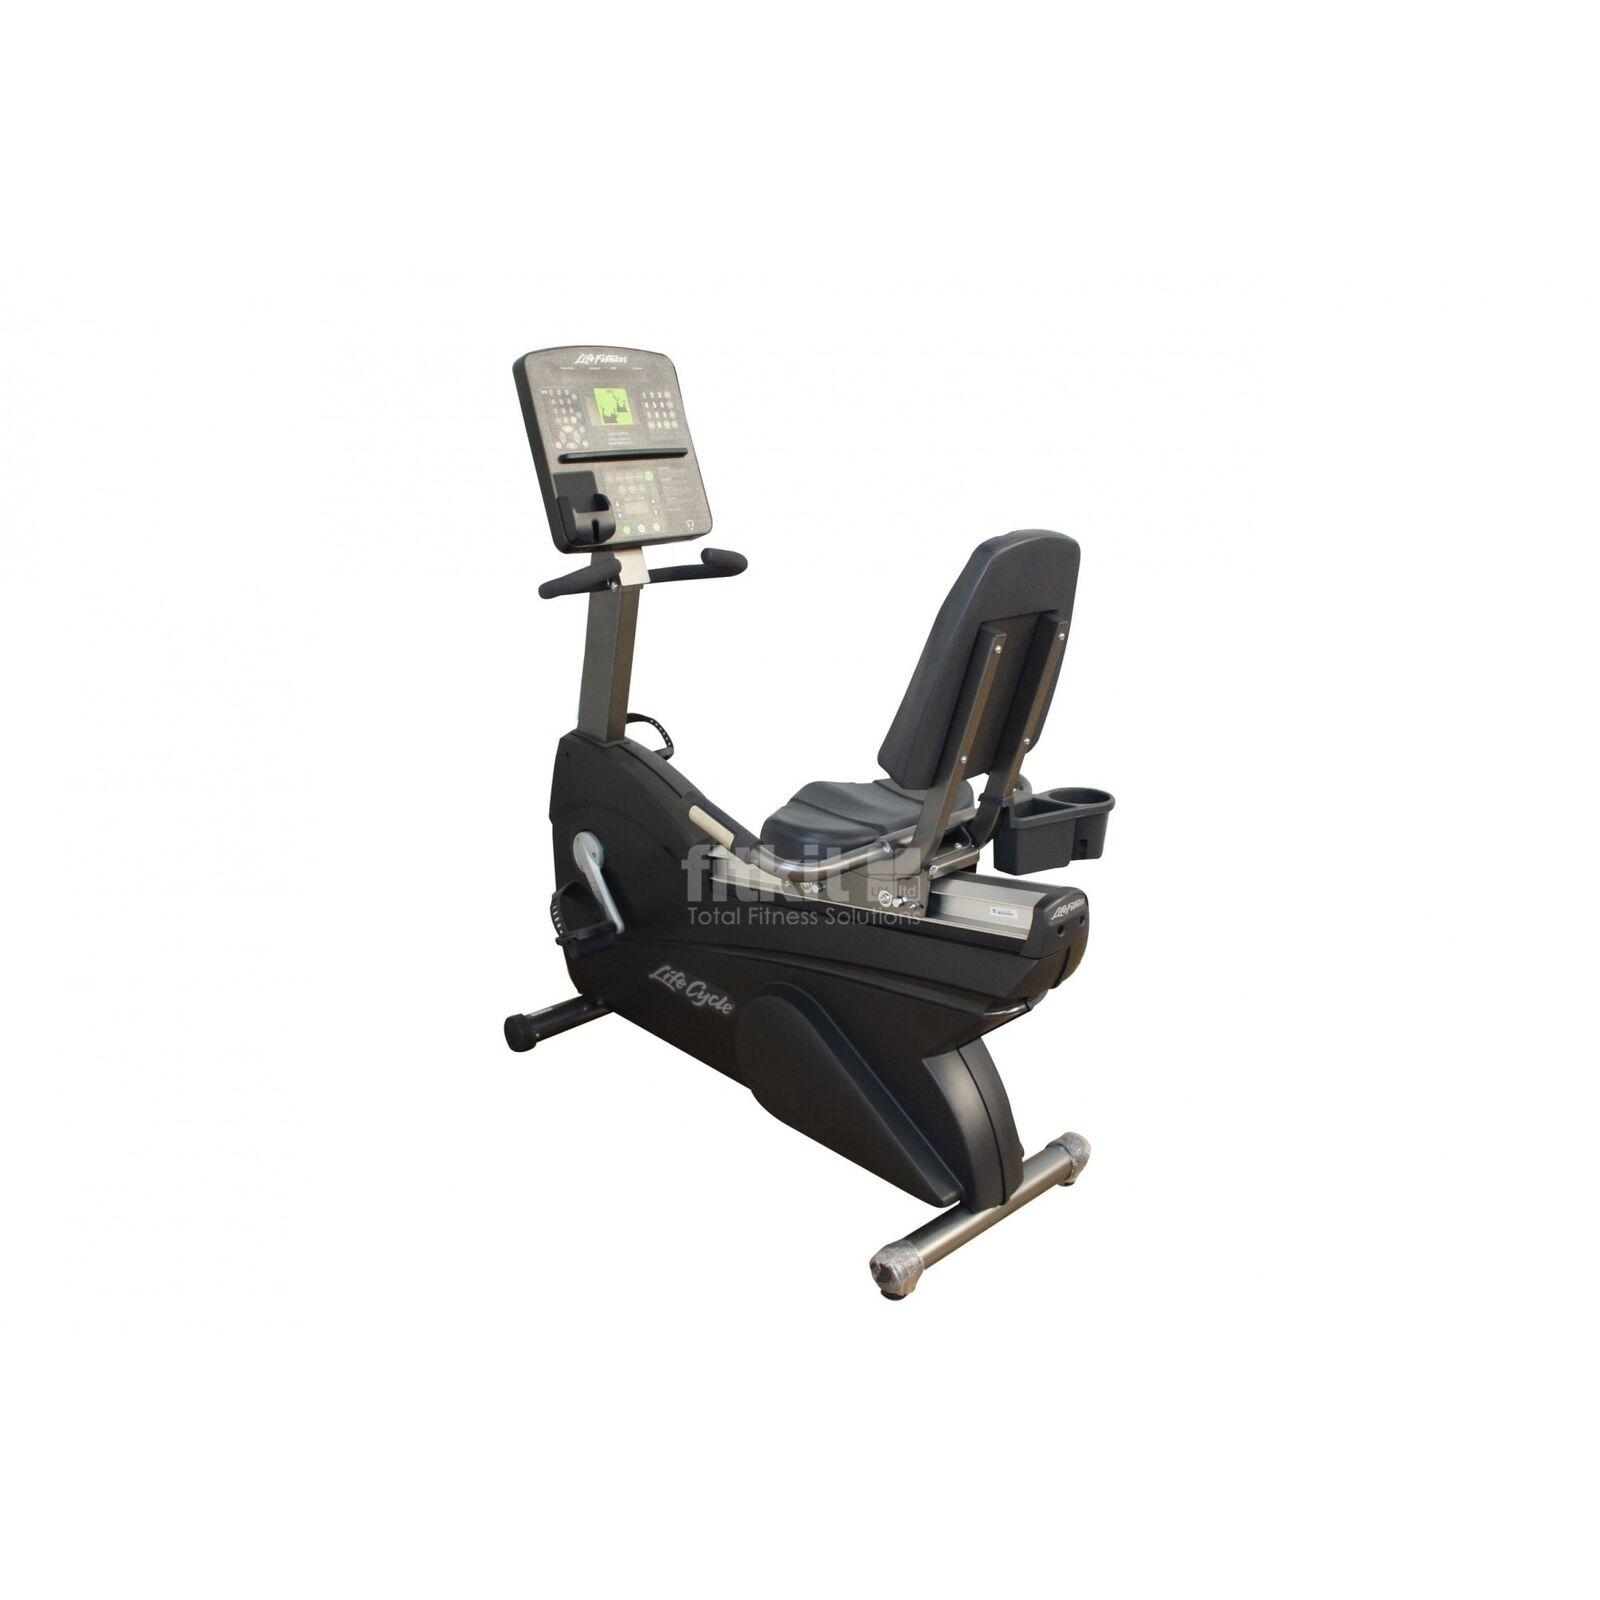 Life Fitness Integrity Ri Recumbent Bike (NEW) - Commercial Gym Equipment